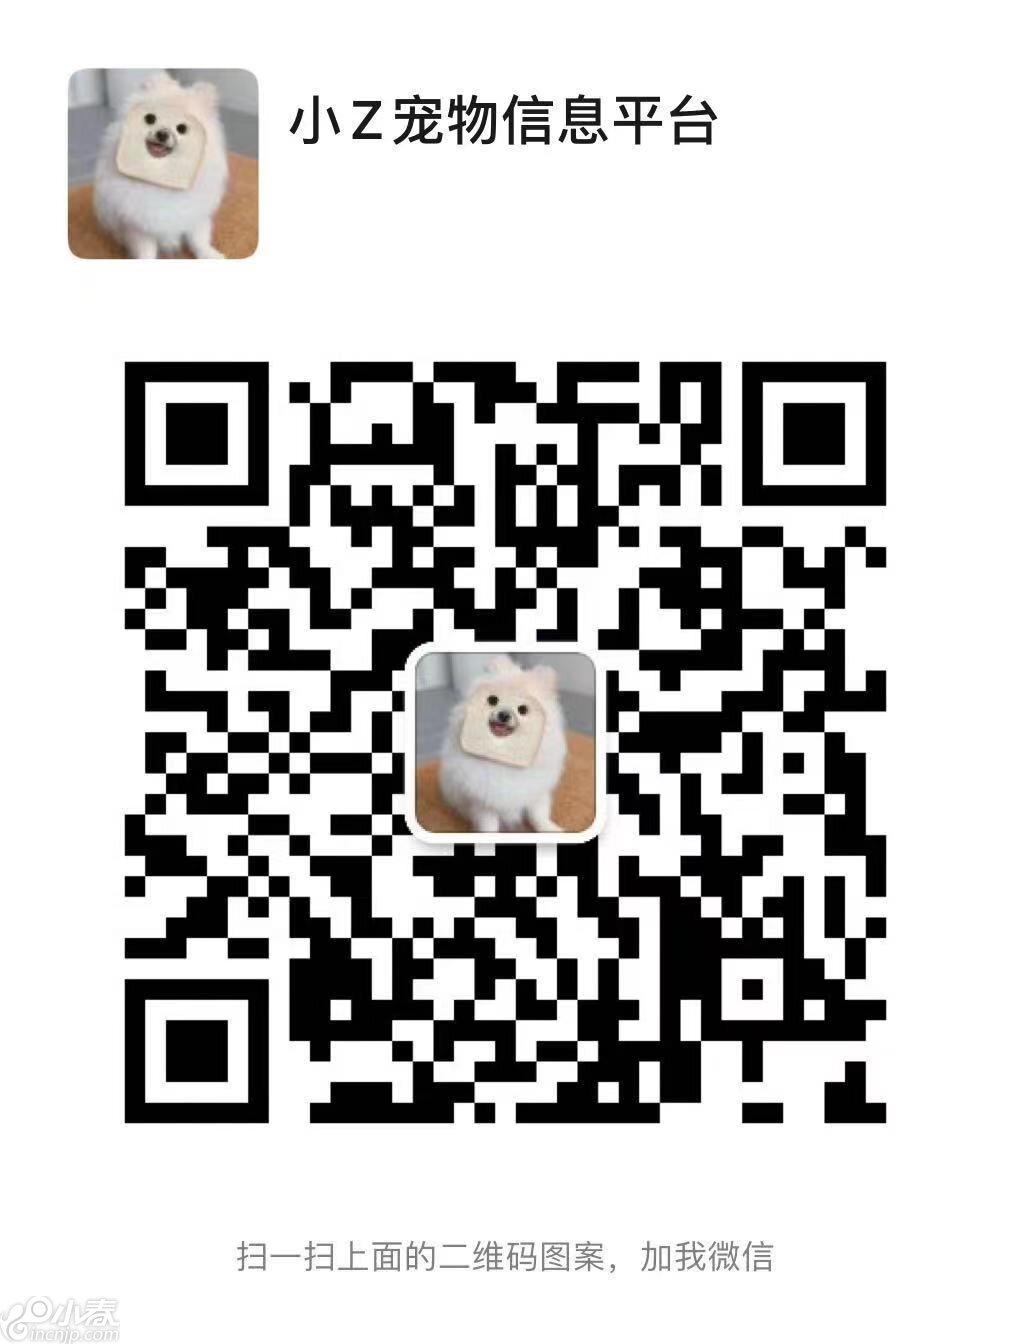 27311371-1E23-4E85-9A4A-B468B878C3AA.jpeg